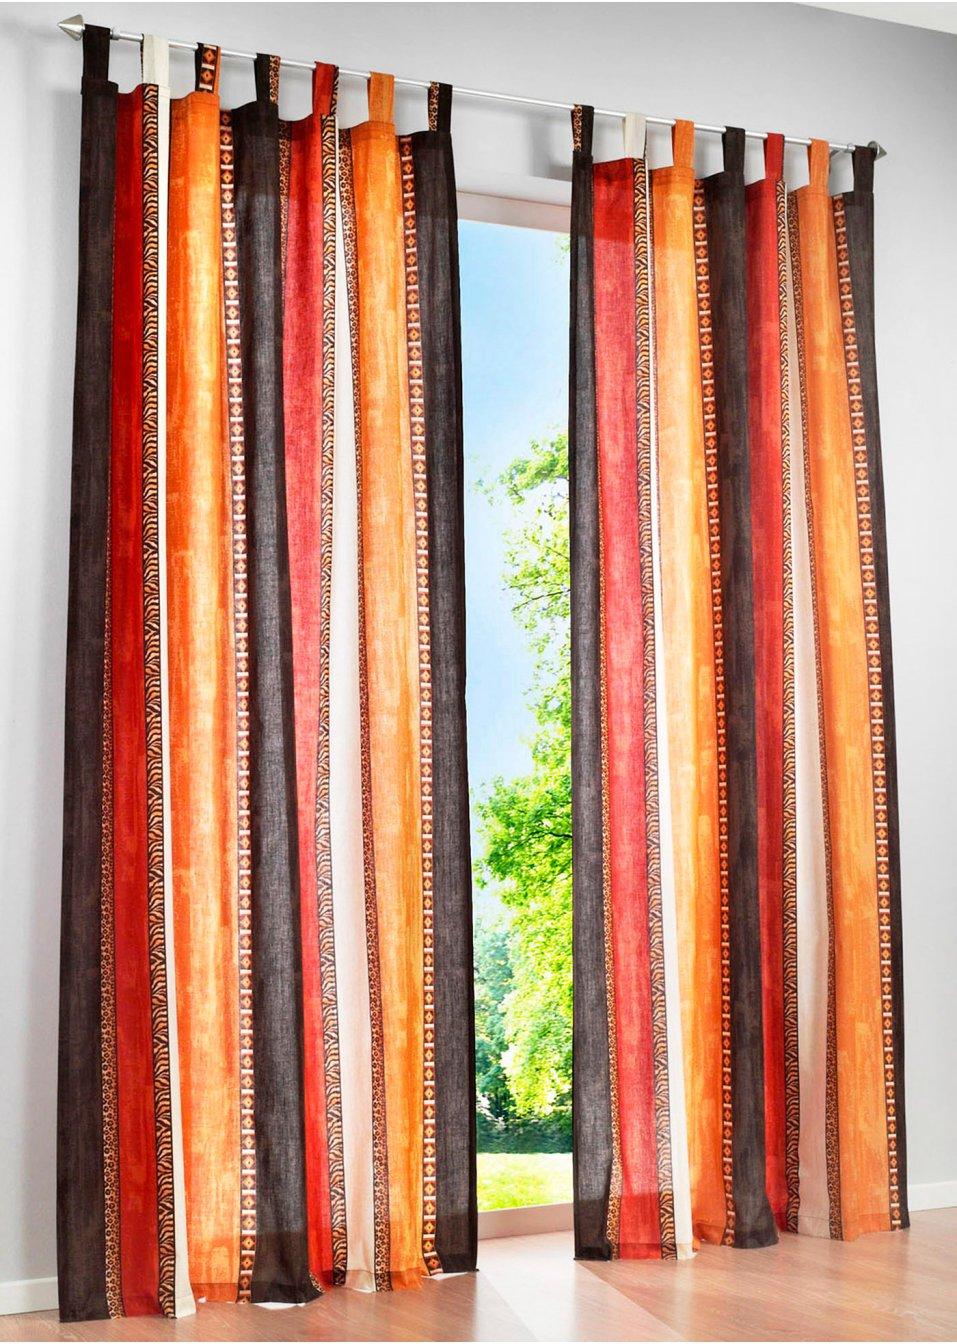 halbtransparenter vorhang ethno im modernen blockstreifen look terra schlaufen 1er pack. Black Bedroom Furniture Sets. Home Design Ideas